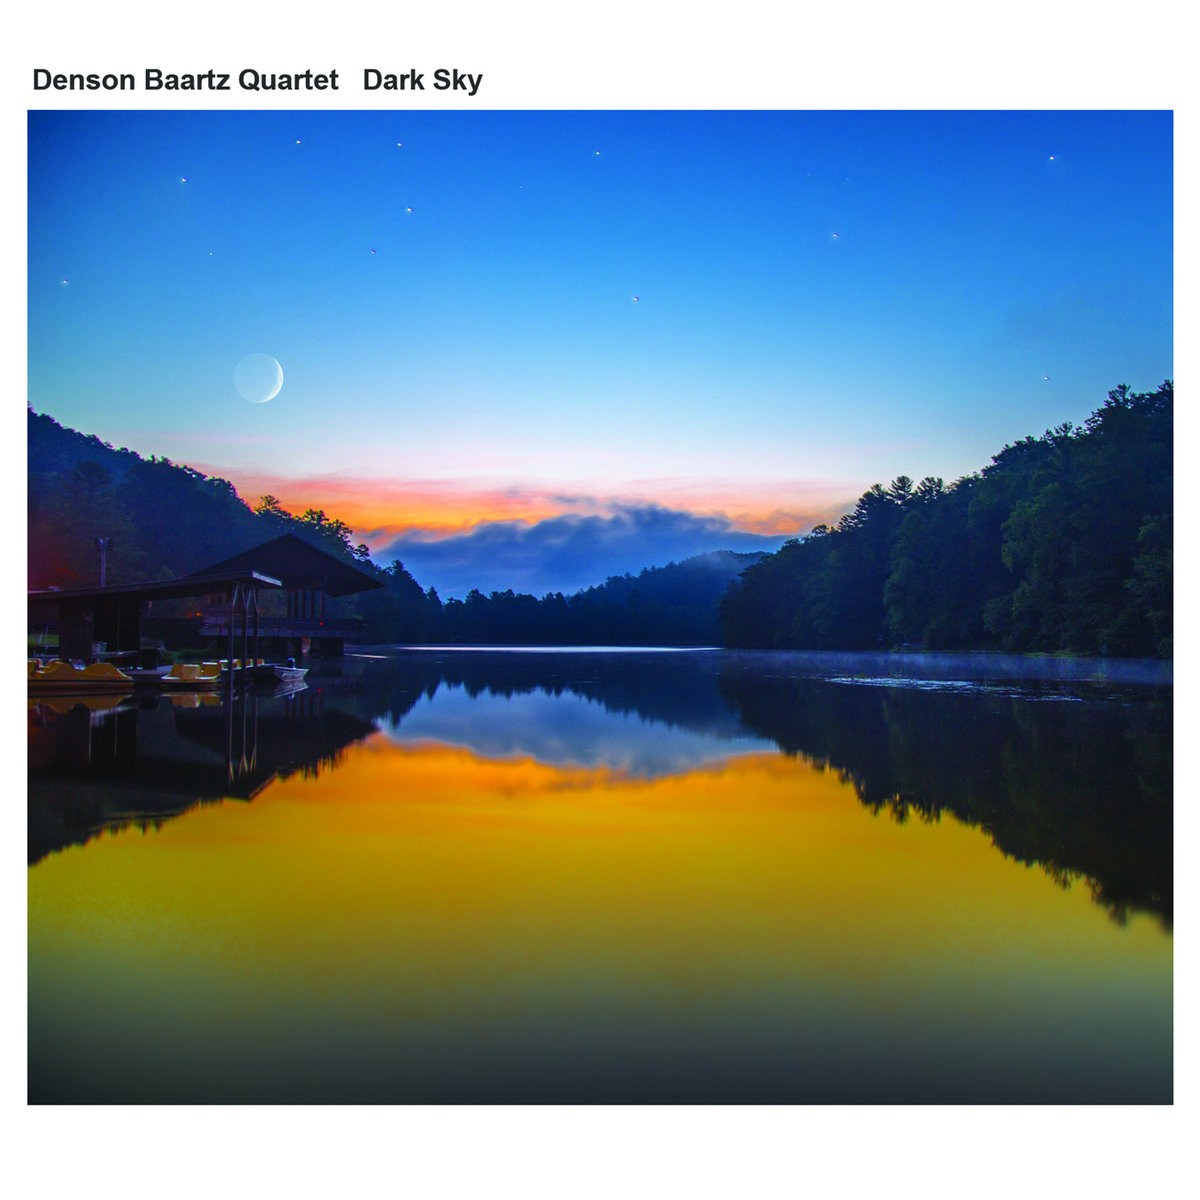 Denson-Baartz-album_1200x